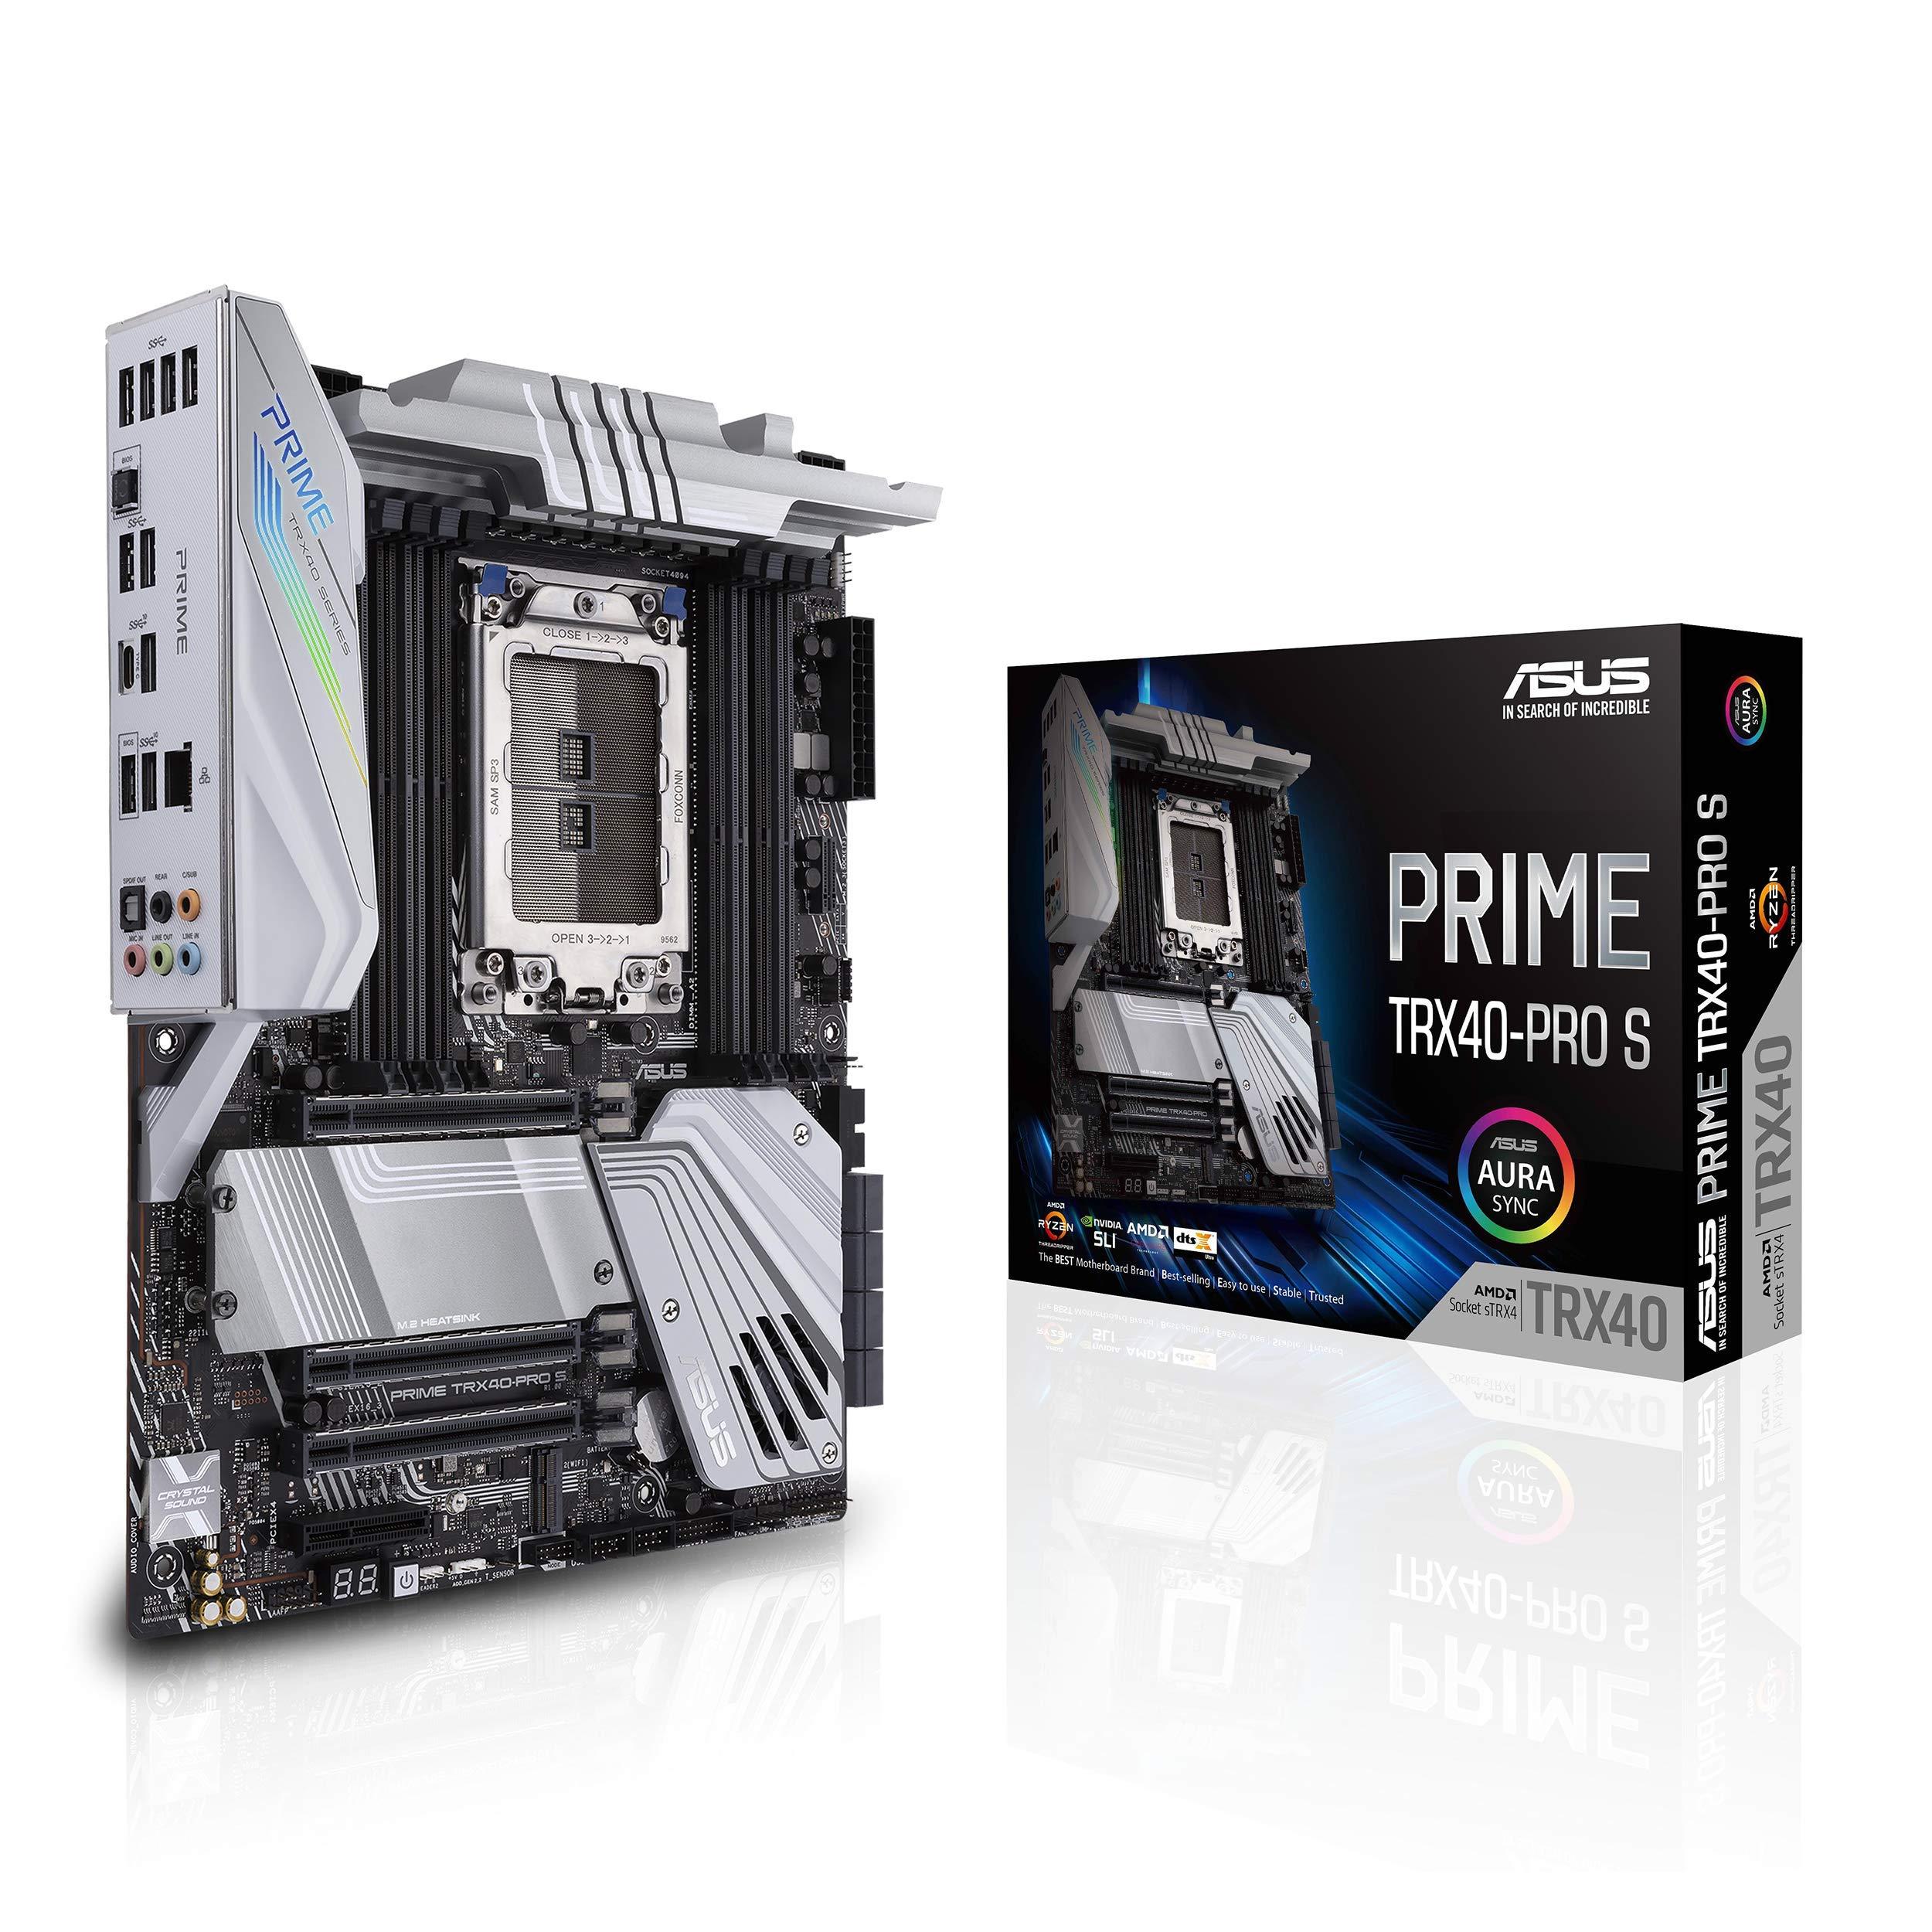 ASUS Prime TRX40-Pro S AMD STRX4 3rd Gen Ryzen Threadripper